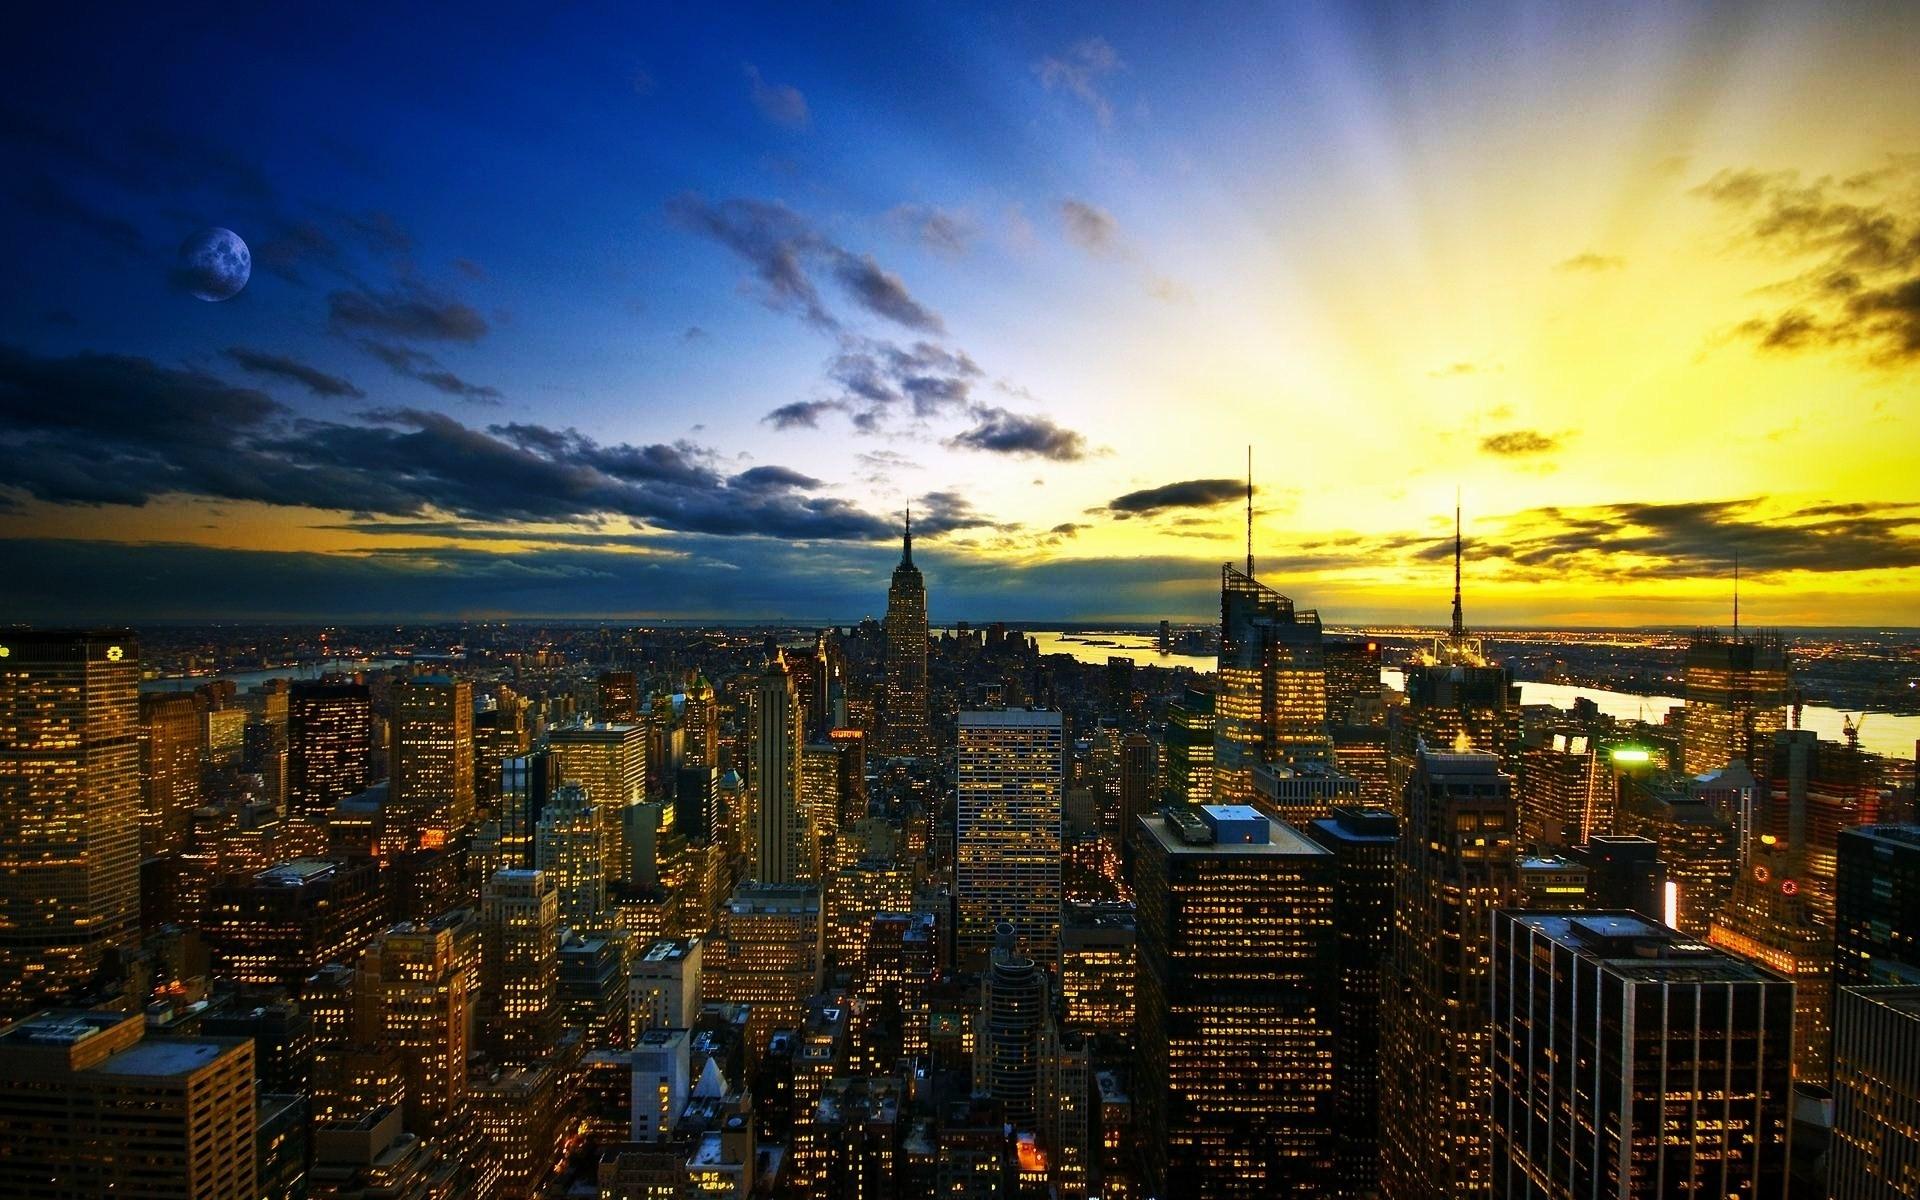 sunset nyc wallpaper hd - 10 000 fonds d'écran hd gratuits et de